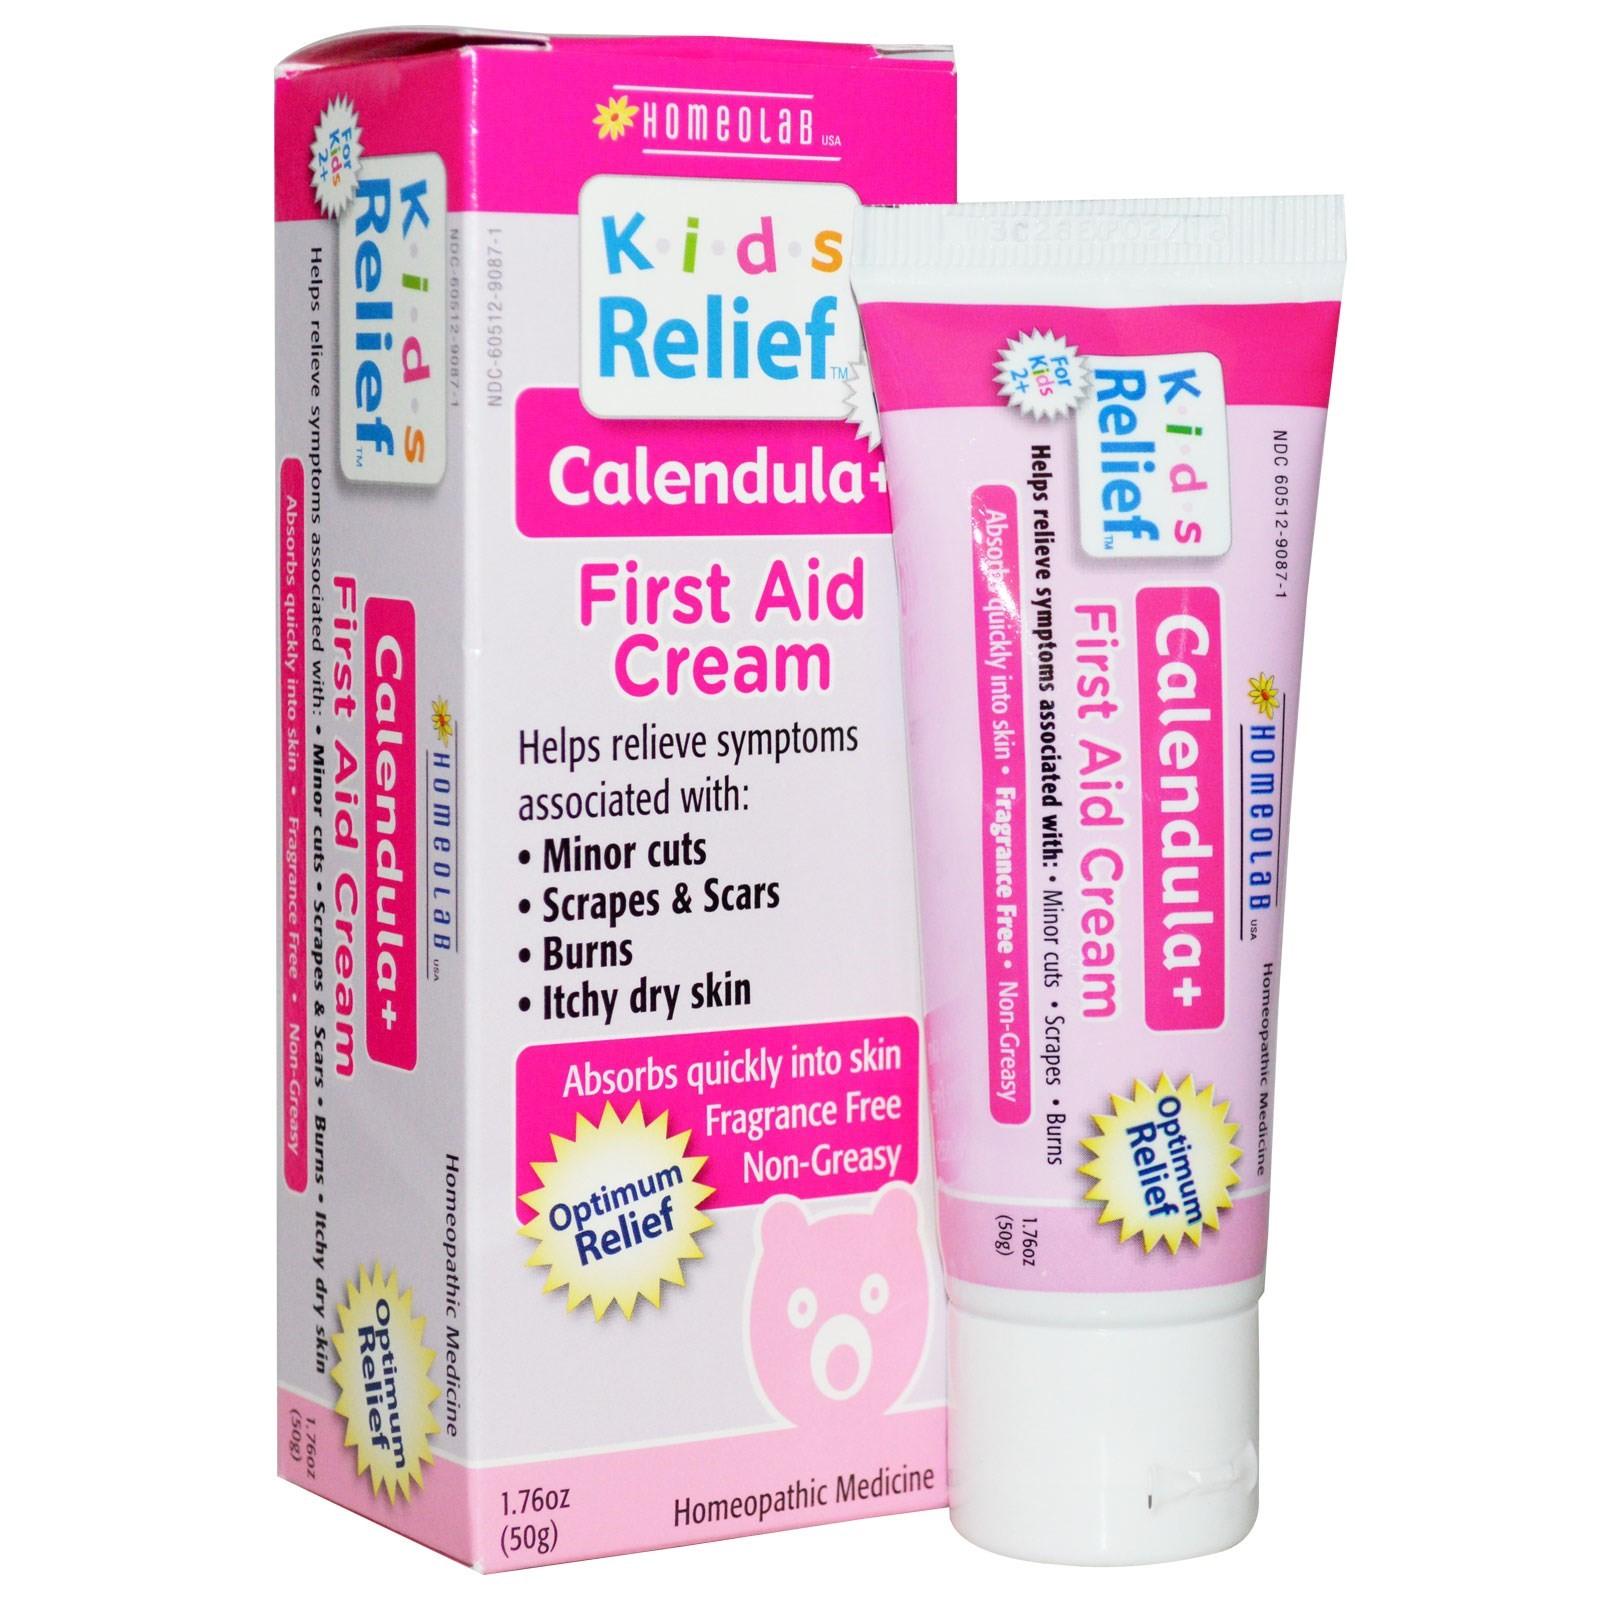 Homeolab USA Kids Relief Calendula+ Pain Cream, 1.76 Oz